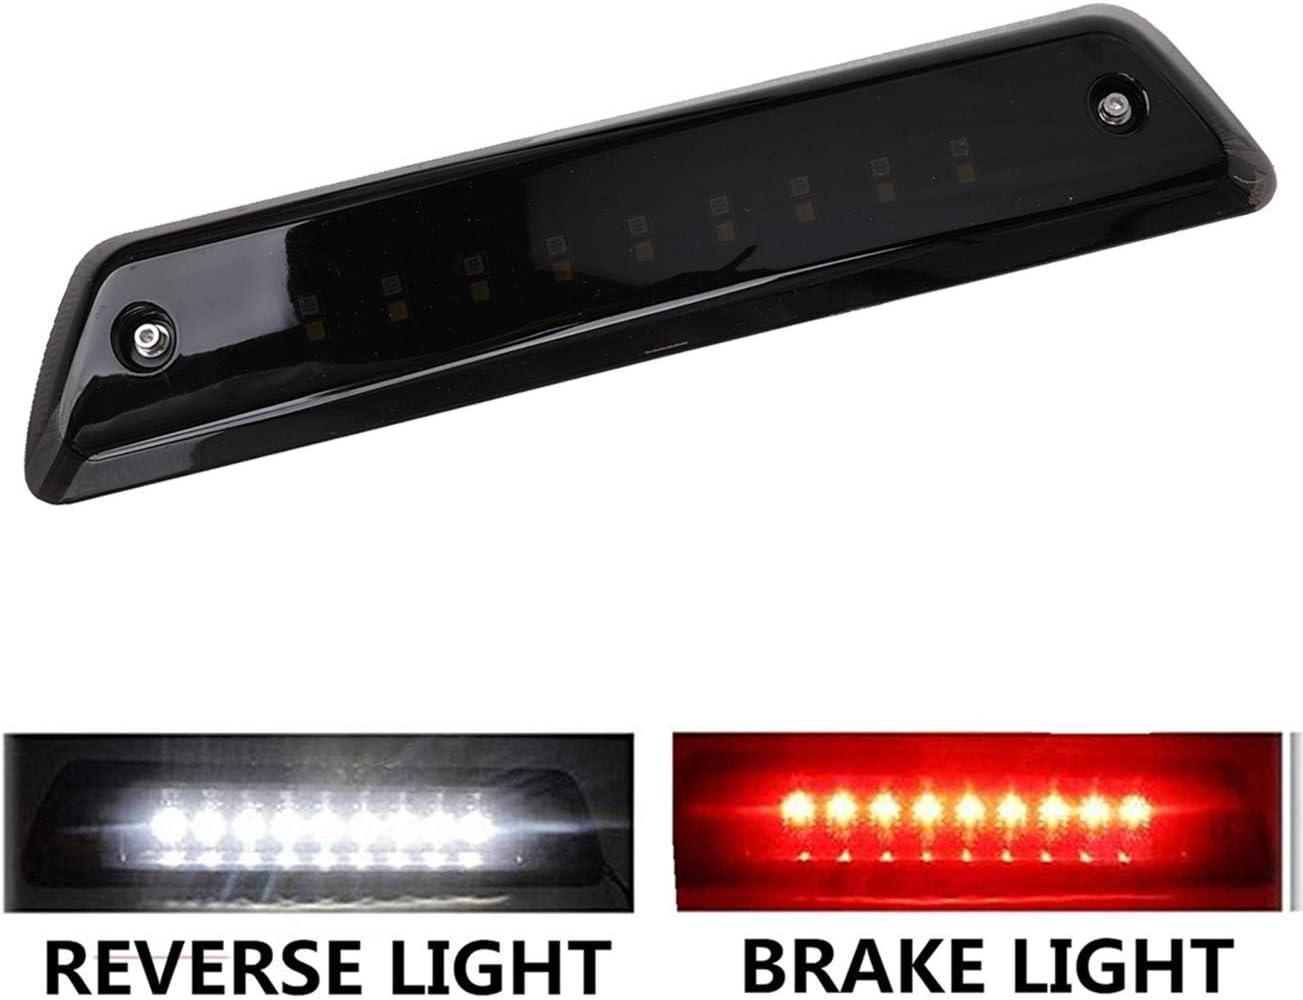 LED 3rd Brake Light fit for Ford F150 2009, 2010, 2011, 2012, 2013, 2014 Reverse Lamp High Mount Tail Light Smoke Lens Waterproof